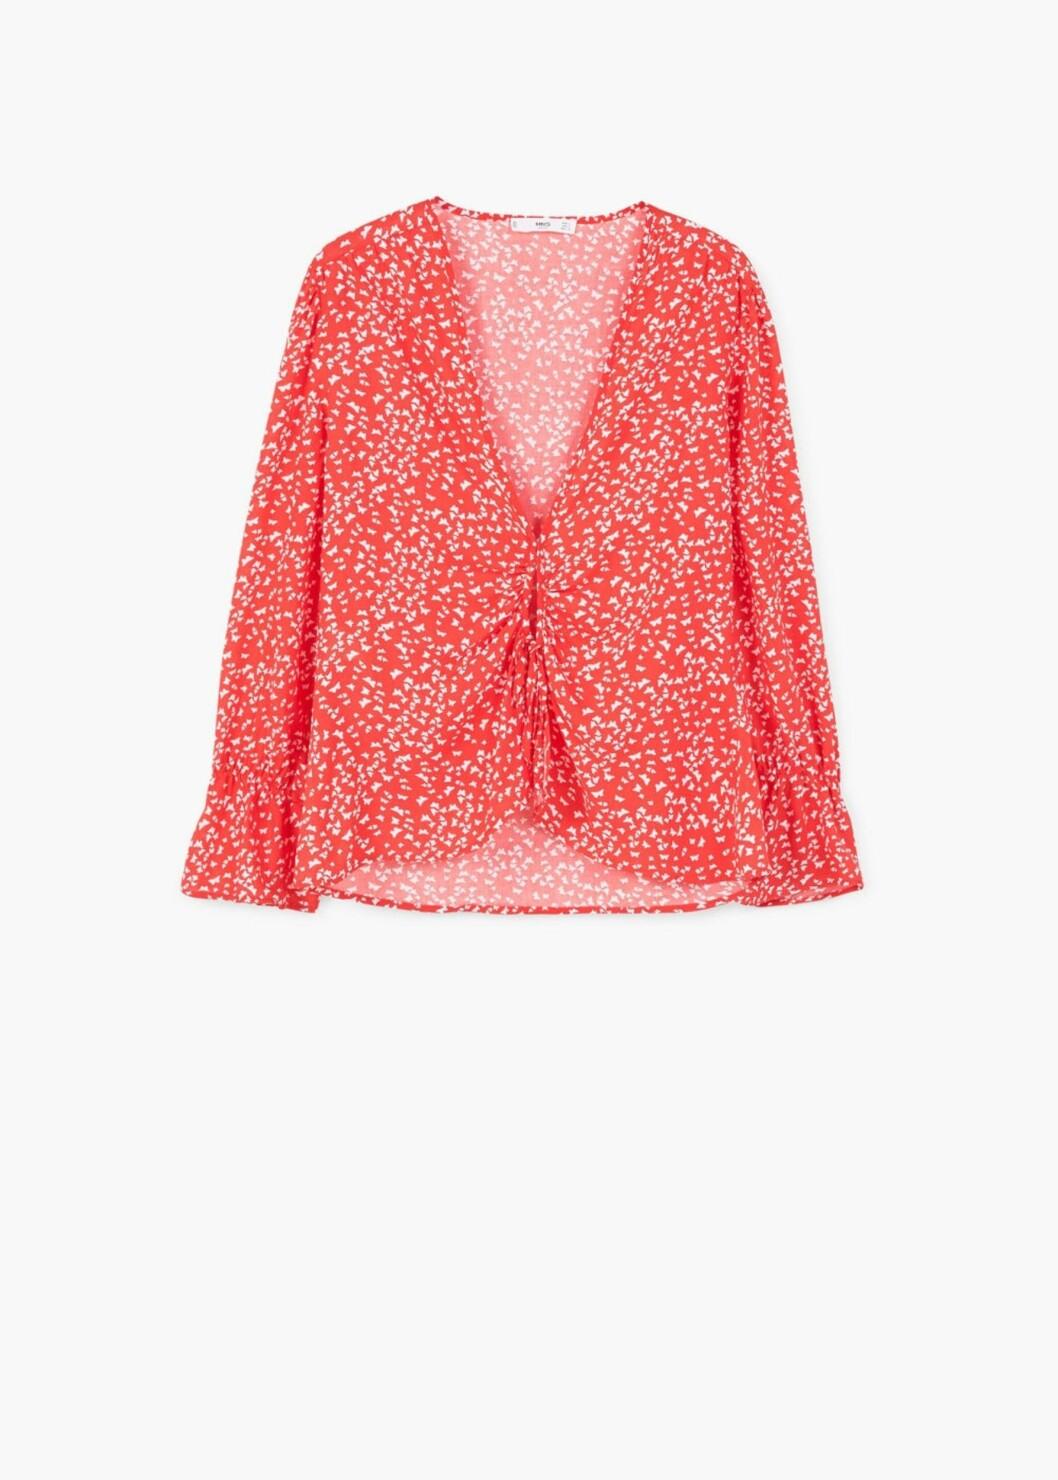 <strong>Bluse fra Mango | kr 299 | http:</strong>//shop.mango.com/NO/p1/damer/kl%C3%A6r/skjorter/bluser/bluse-med-sl%C3%B8yfe-og-trykk?id=13040564_70&n=1&s=prendas.camisas&ts=1494837540994